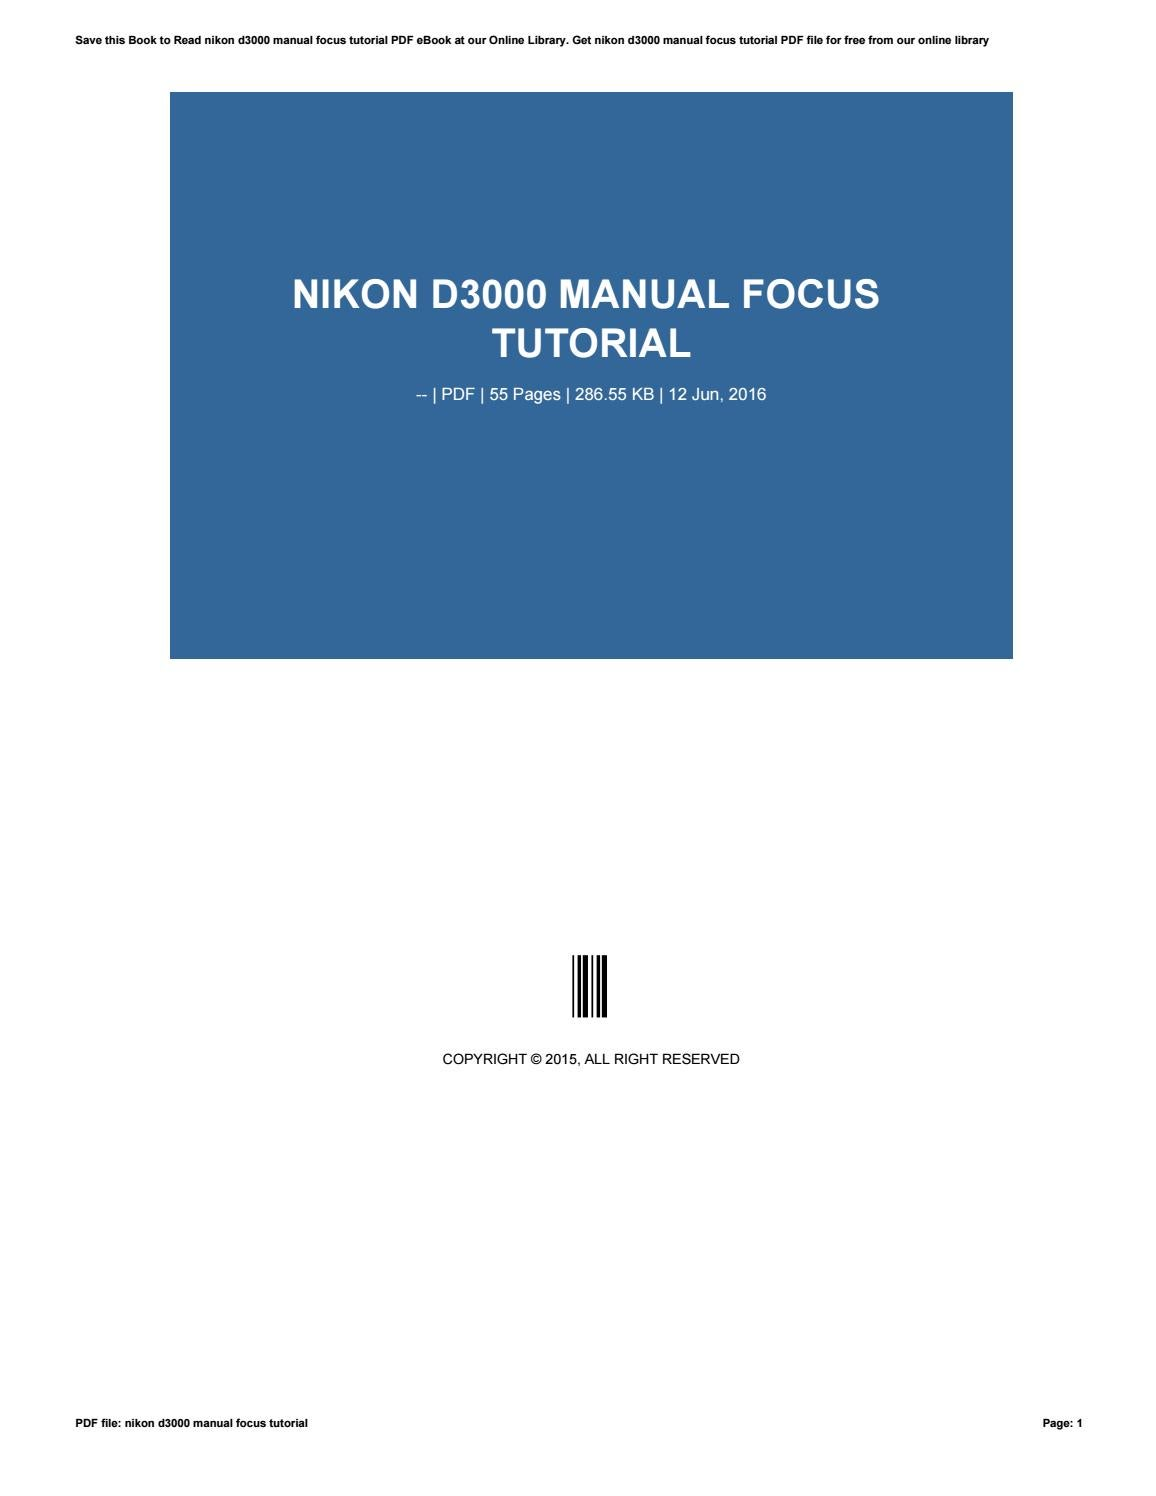 Nikon d3000 manual focus tutorial by 4tb4 issuu baditri Images